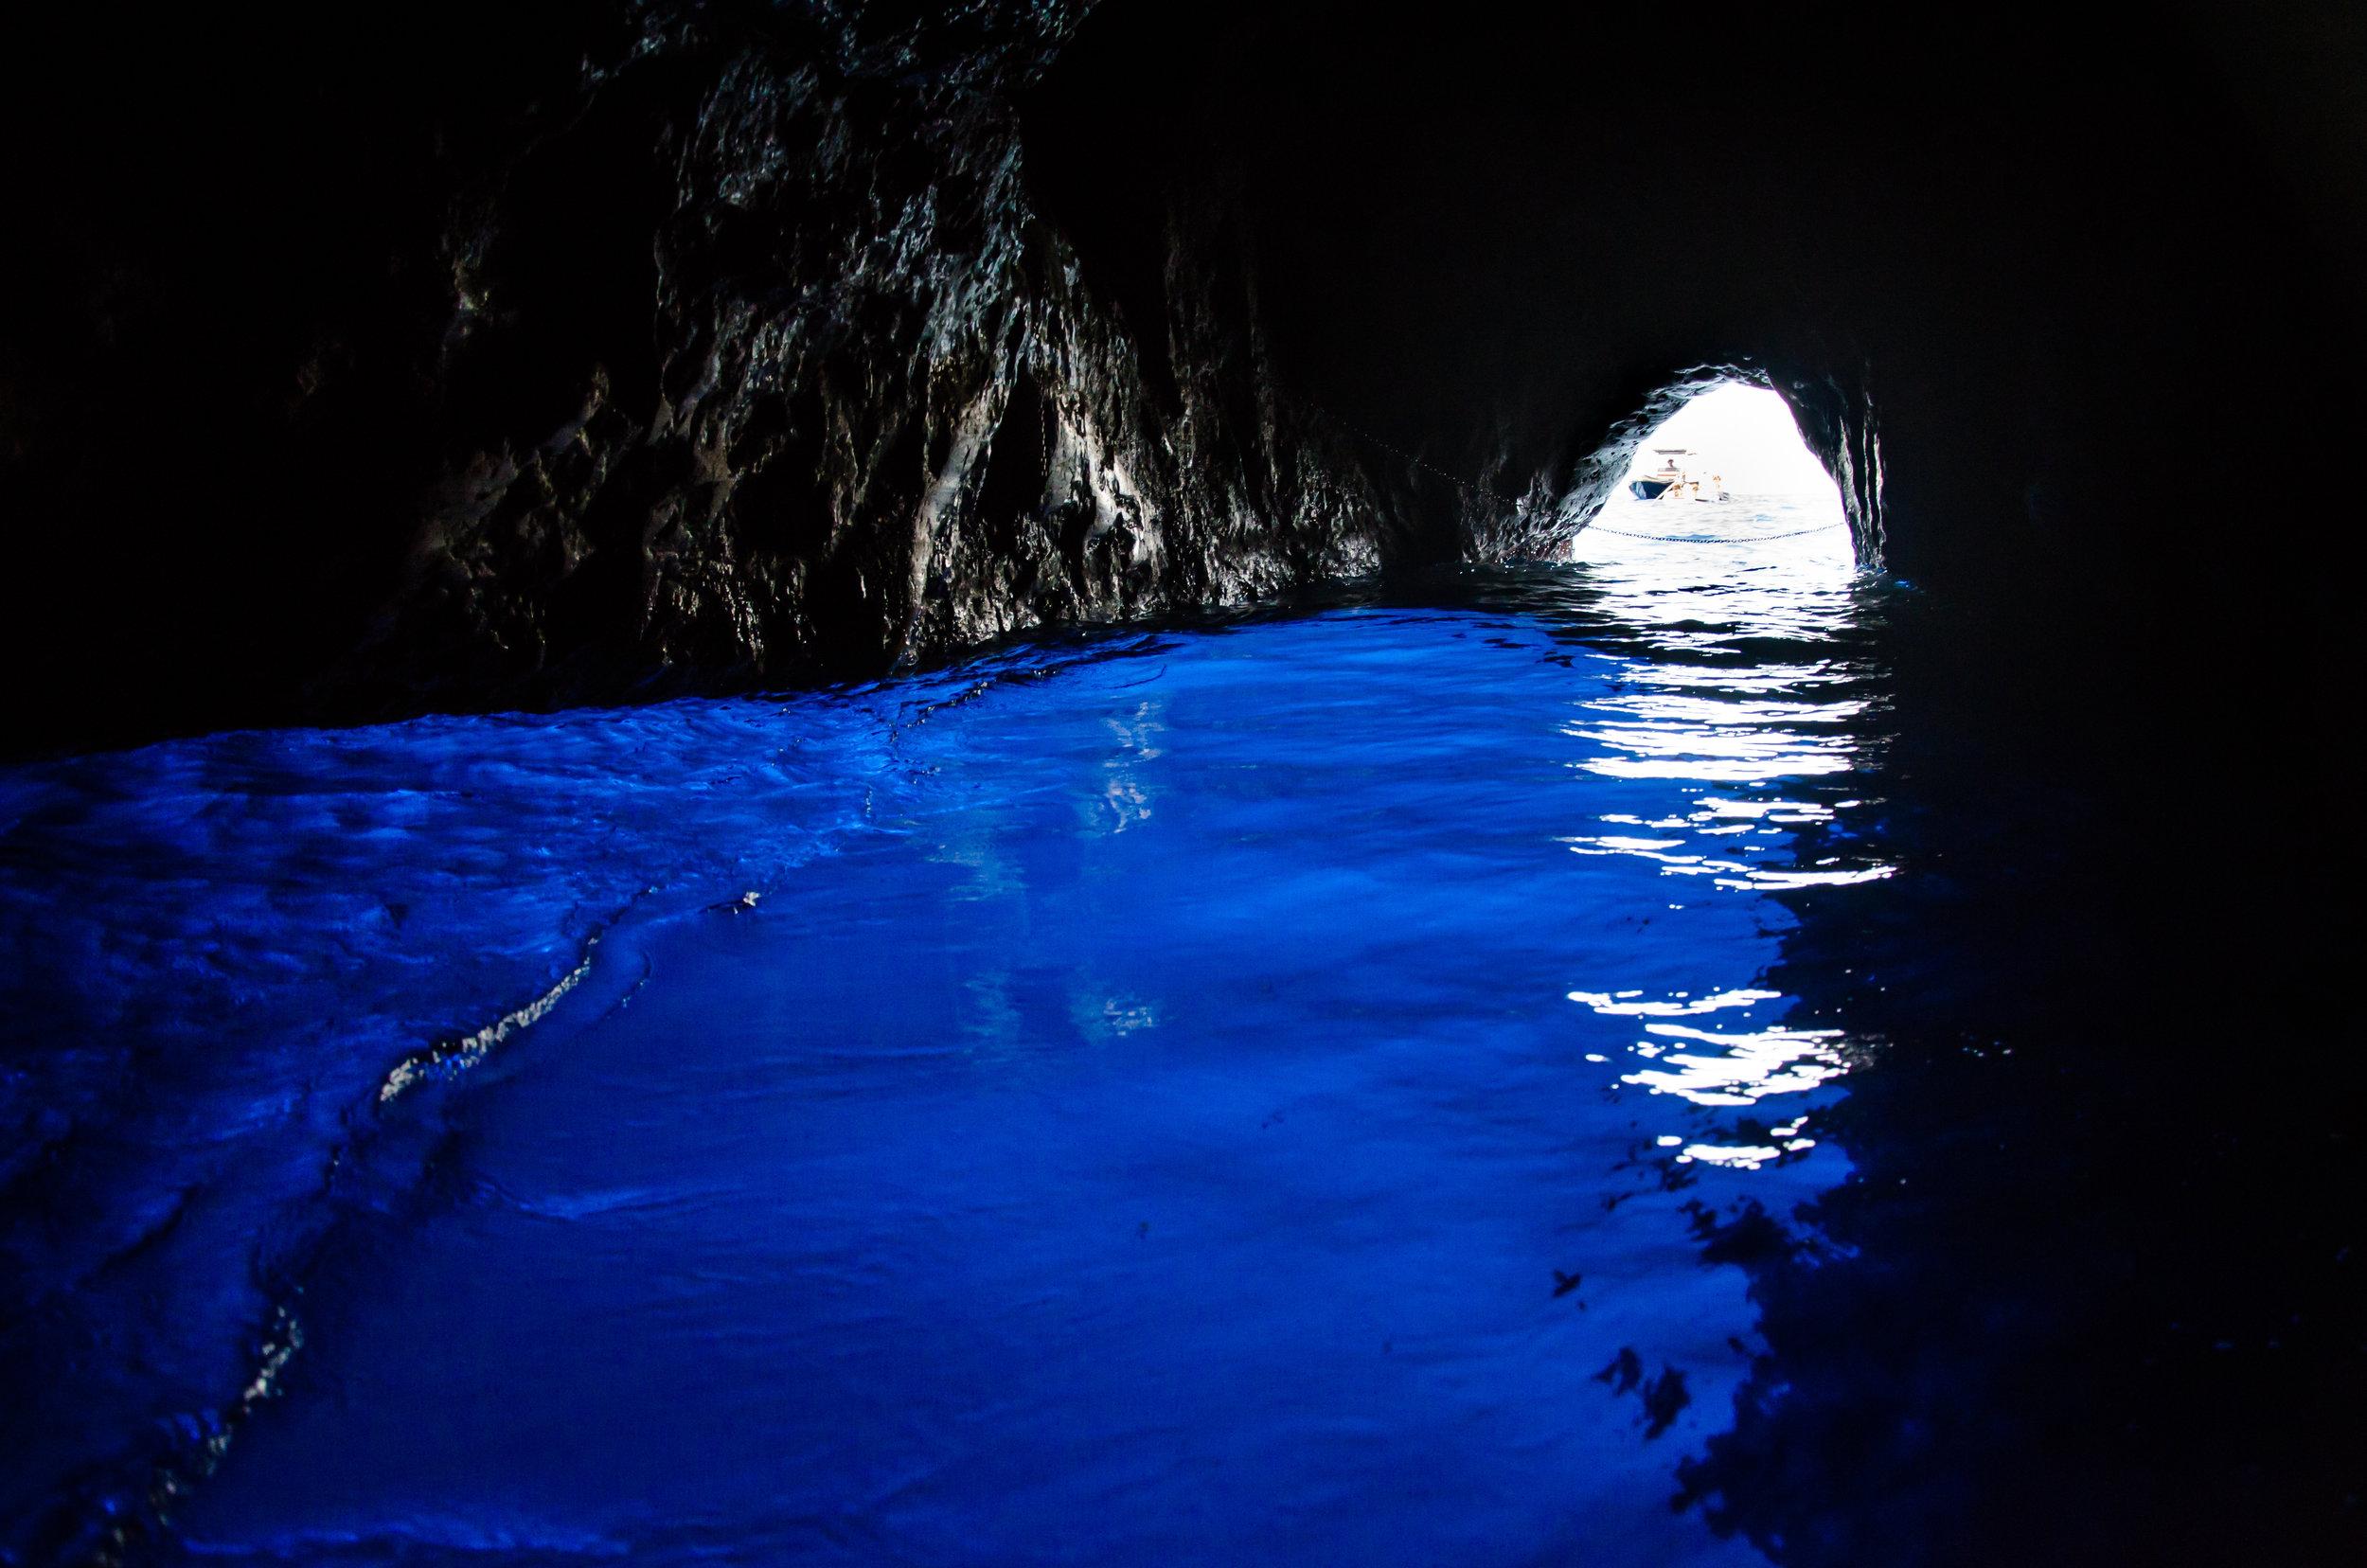 La Grotta Azzurra